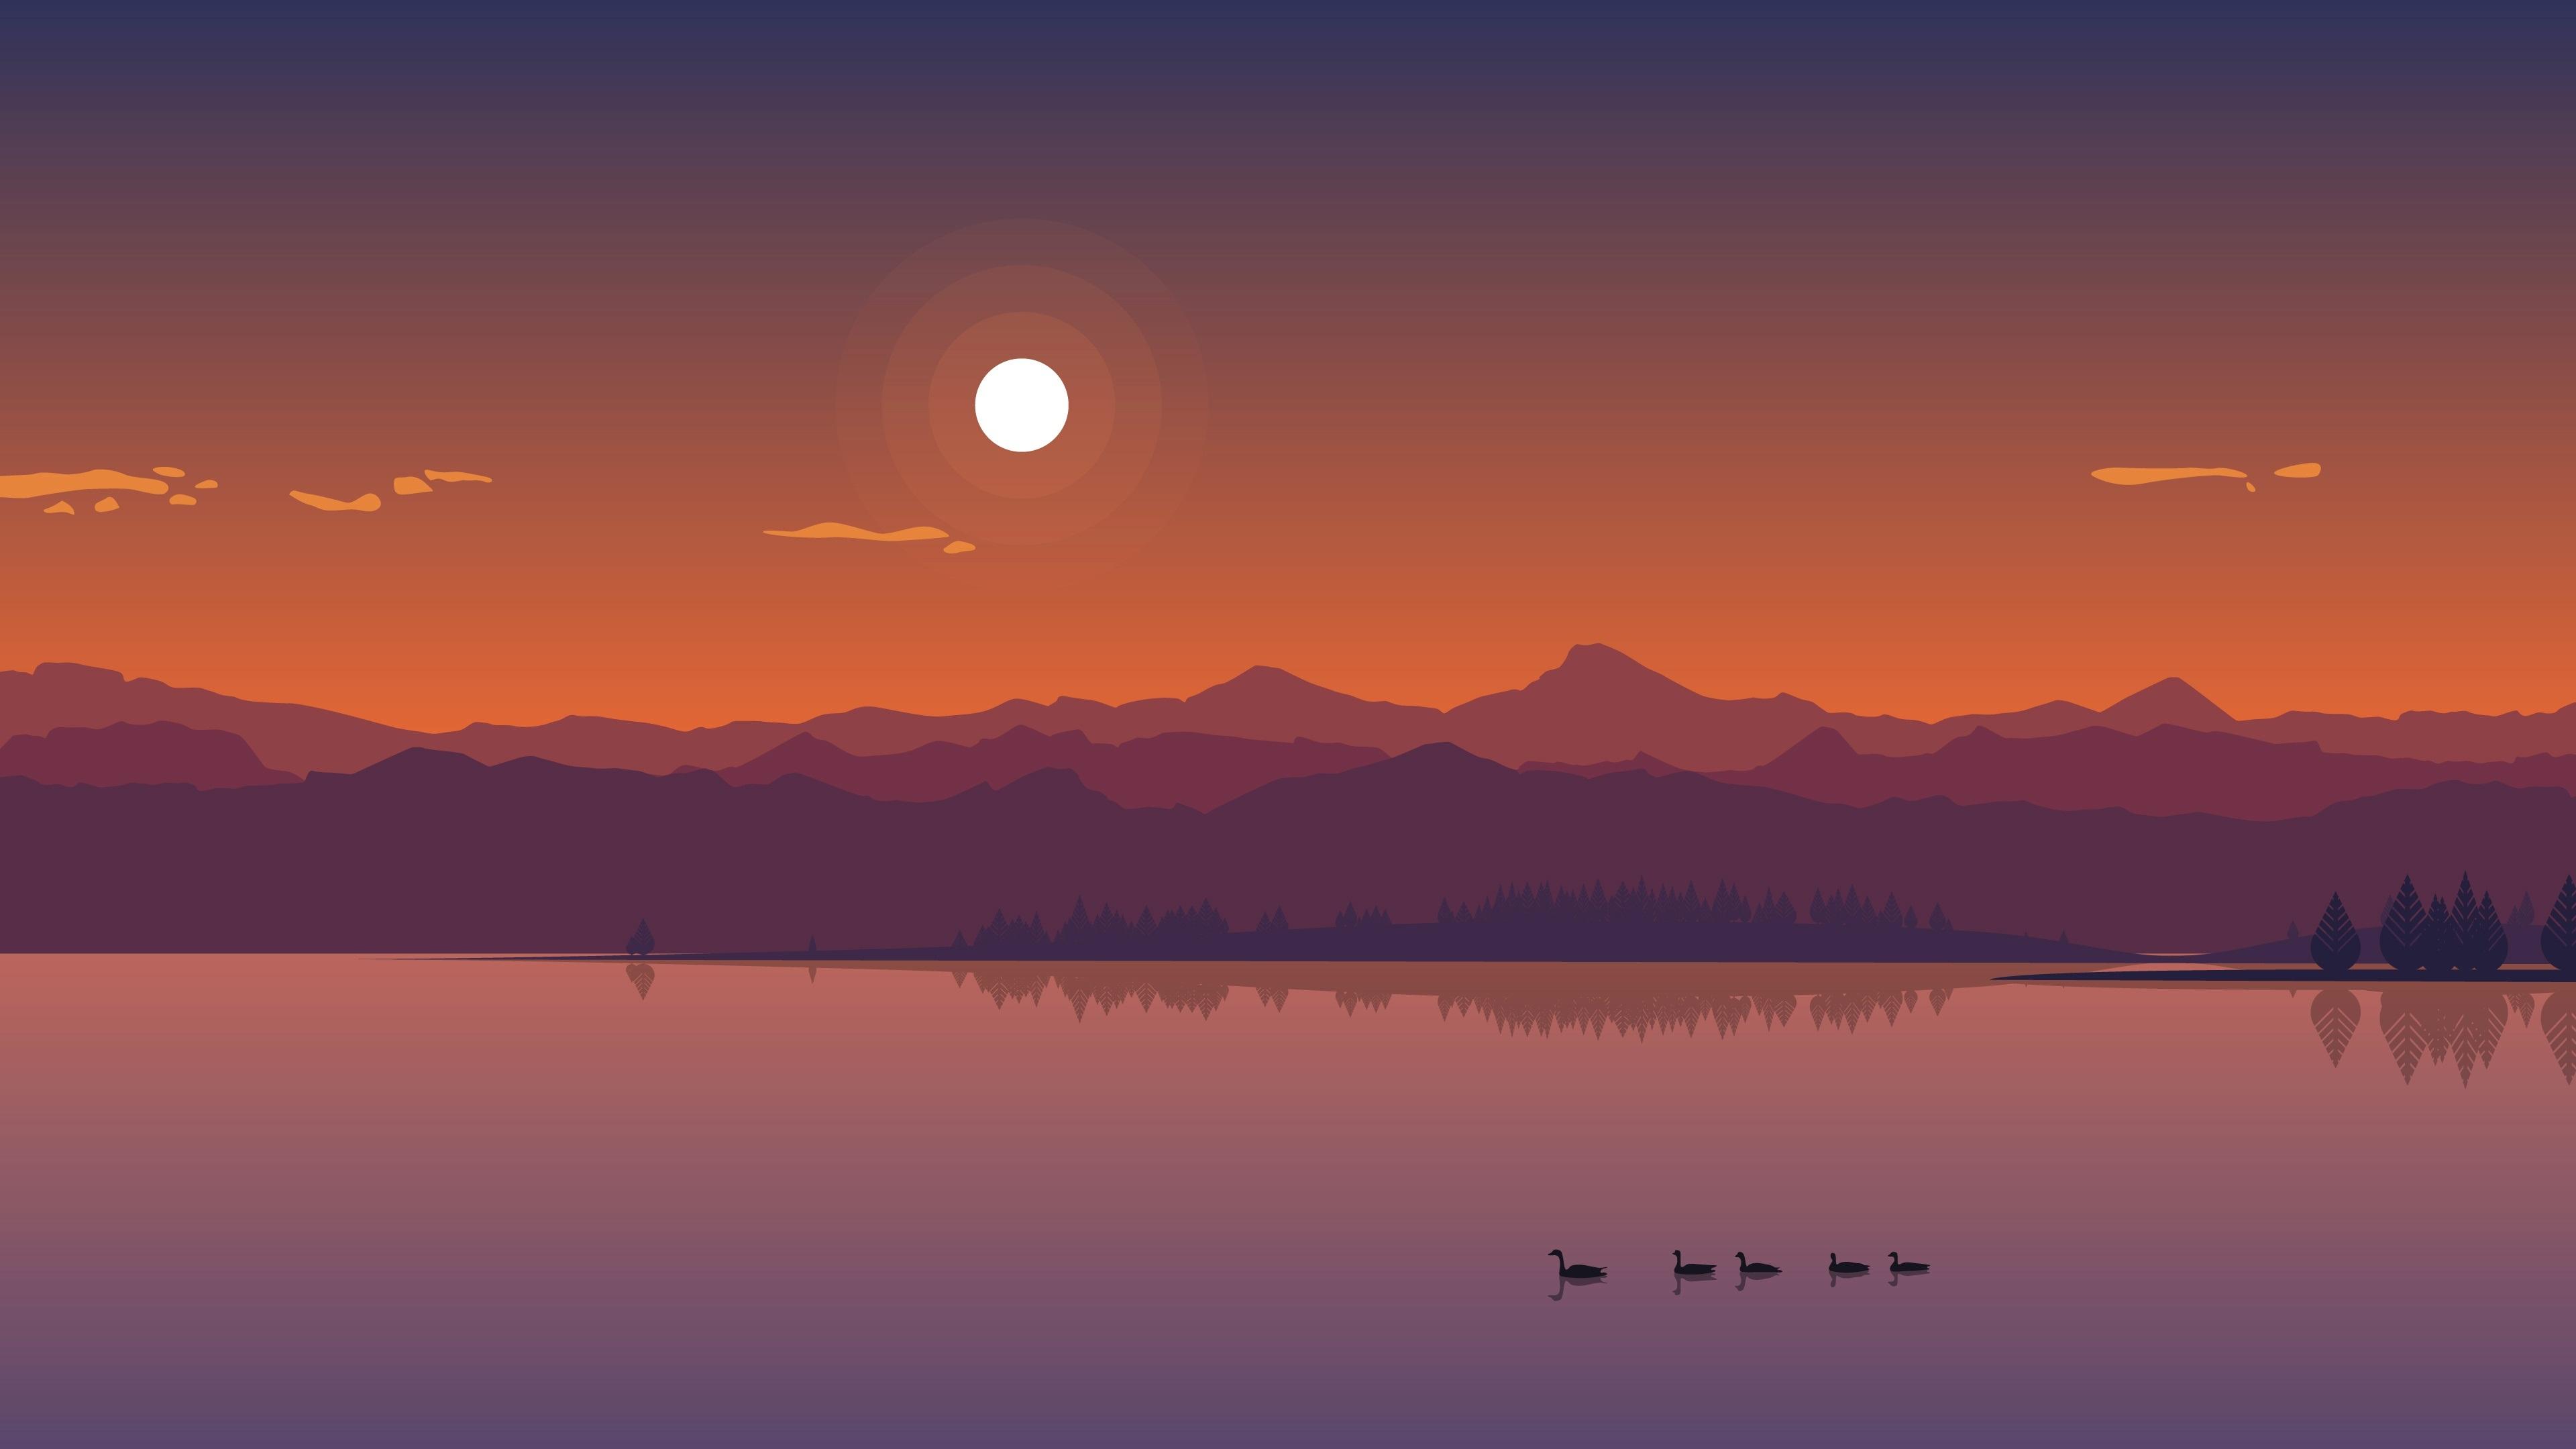 Wallpaper River Mountains Ducks Sun Dusk Vector Art Picture 3840x2160 Uhd 4k Picture Image